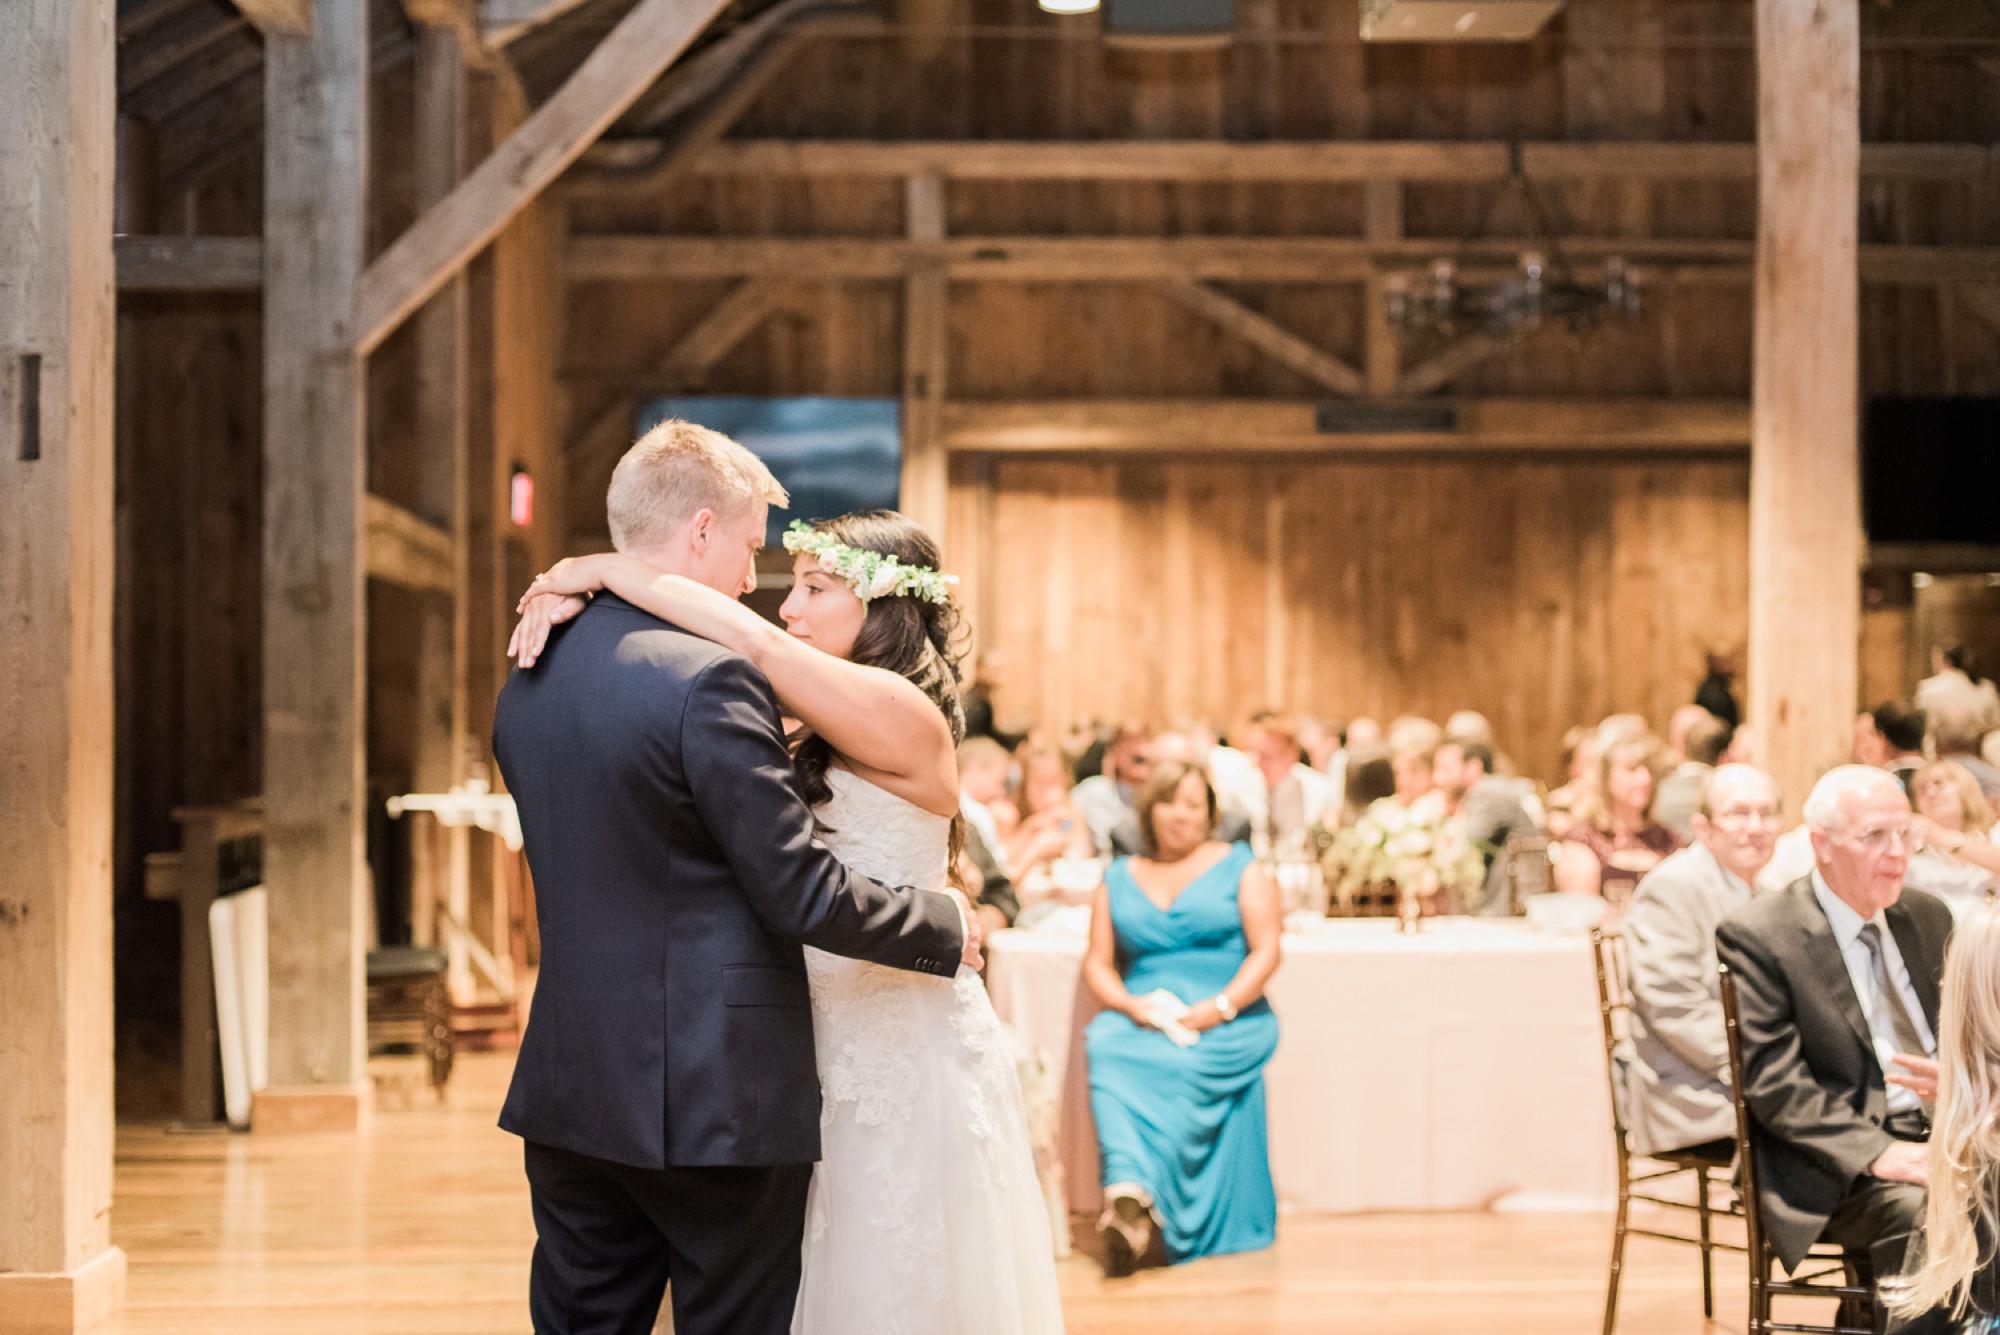 wells-barn-wedding-at-franklin-park-conservatory-129.jpg